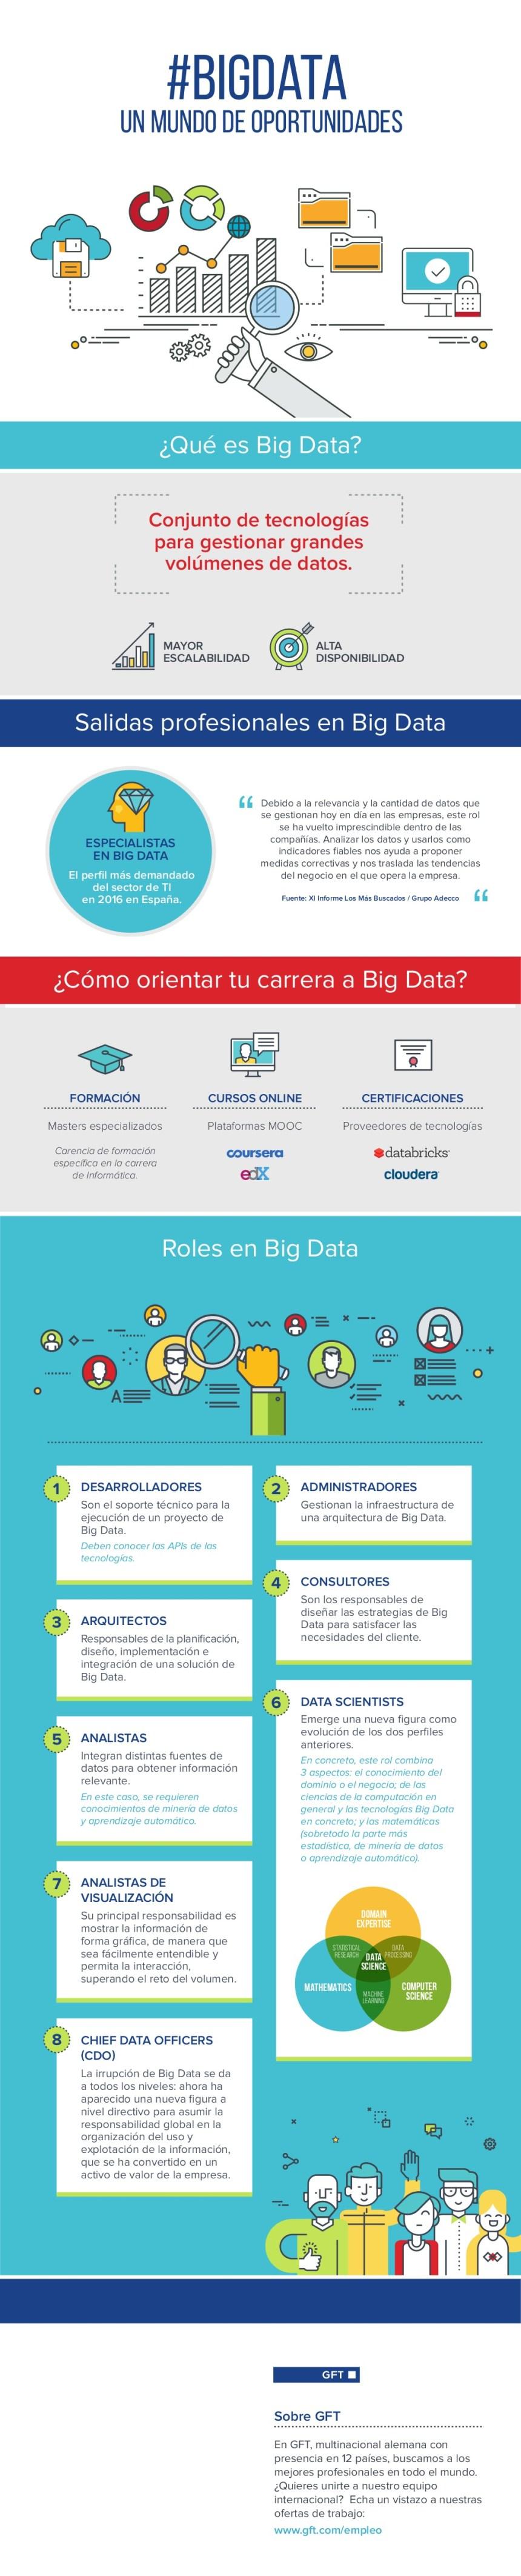 Big Data: Un Mundo de Oportunidades